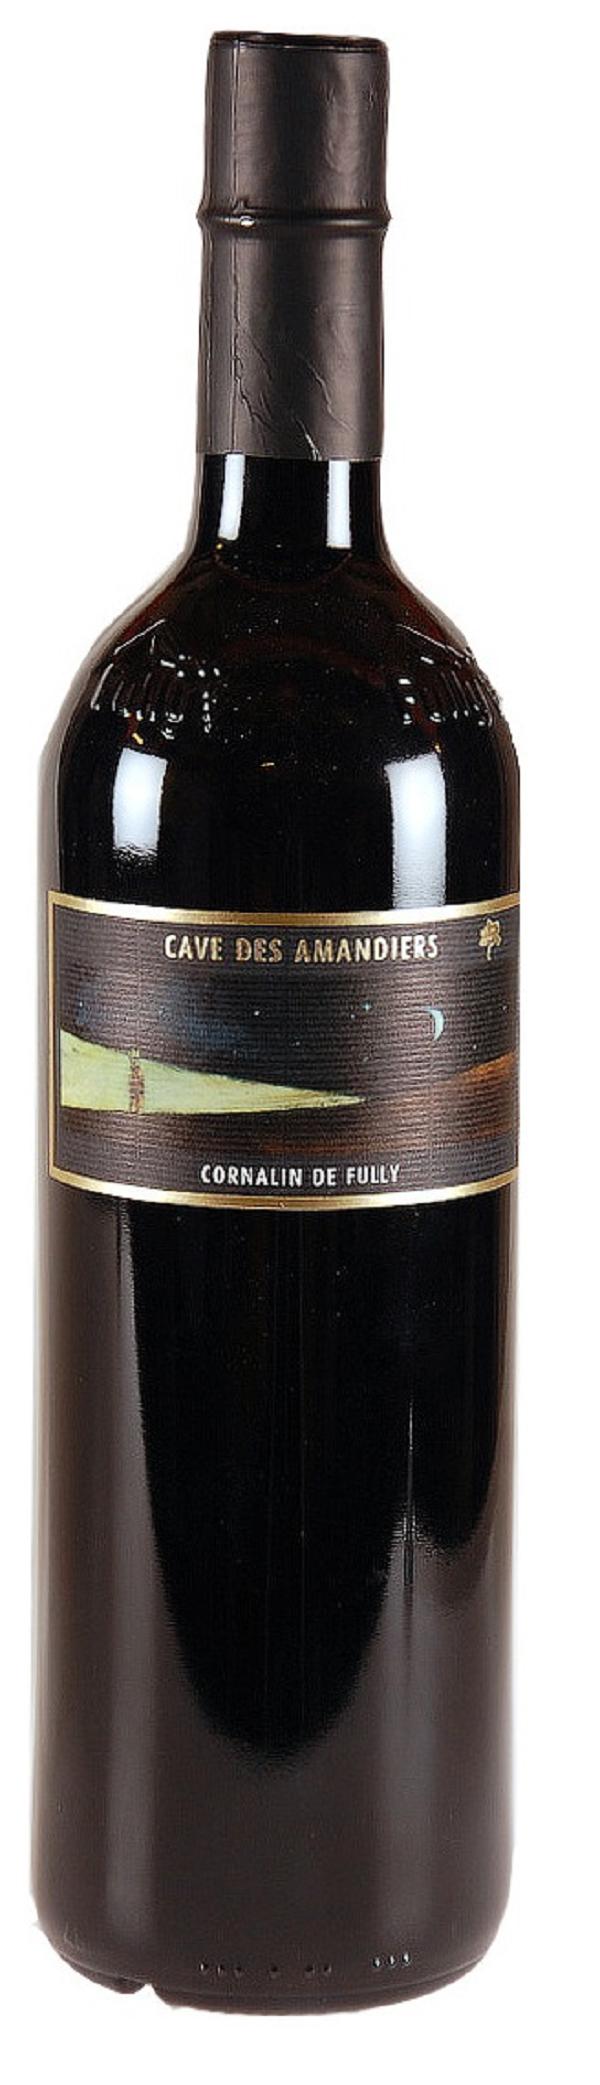 CORNALIN DE FULLY CAVE DES AMANDIERS